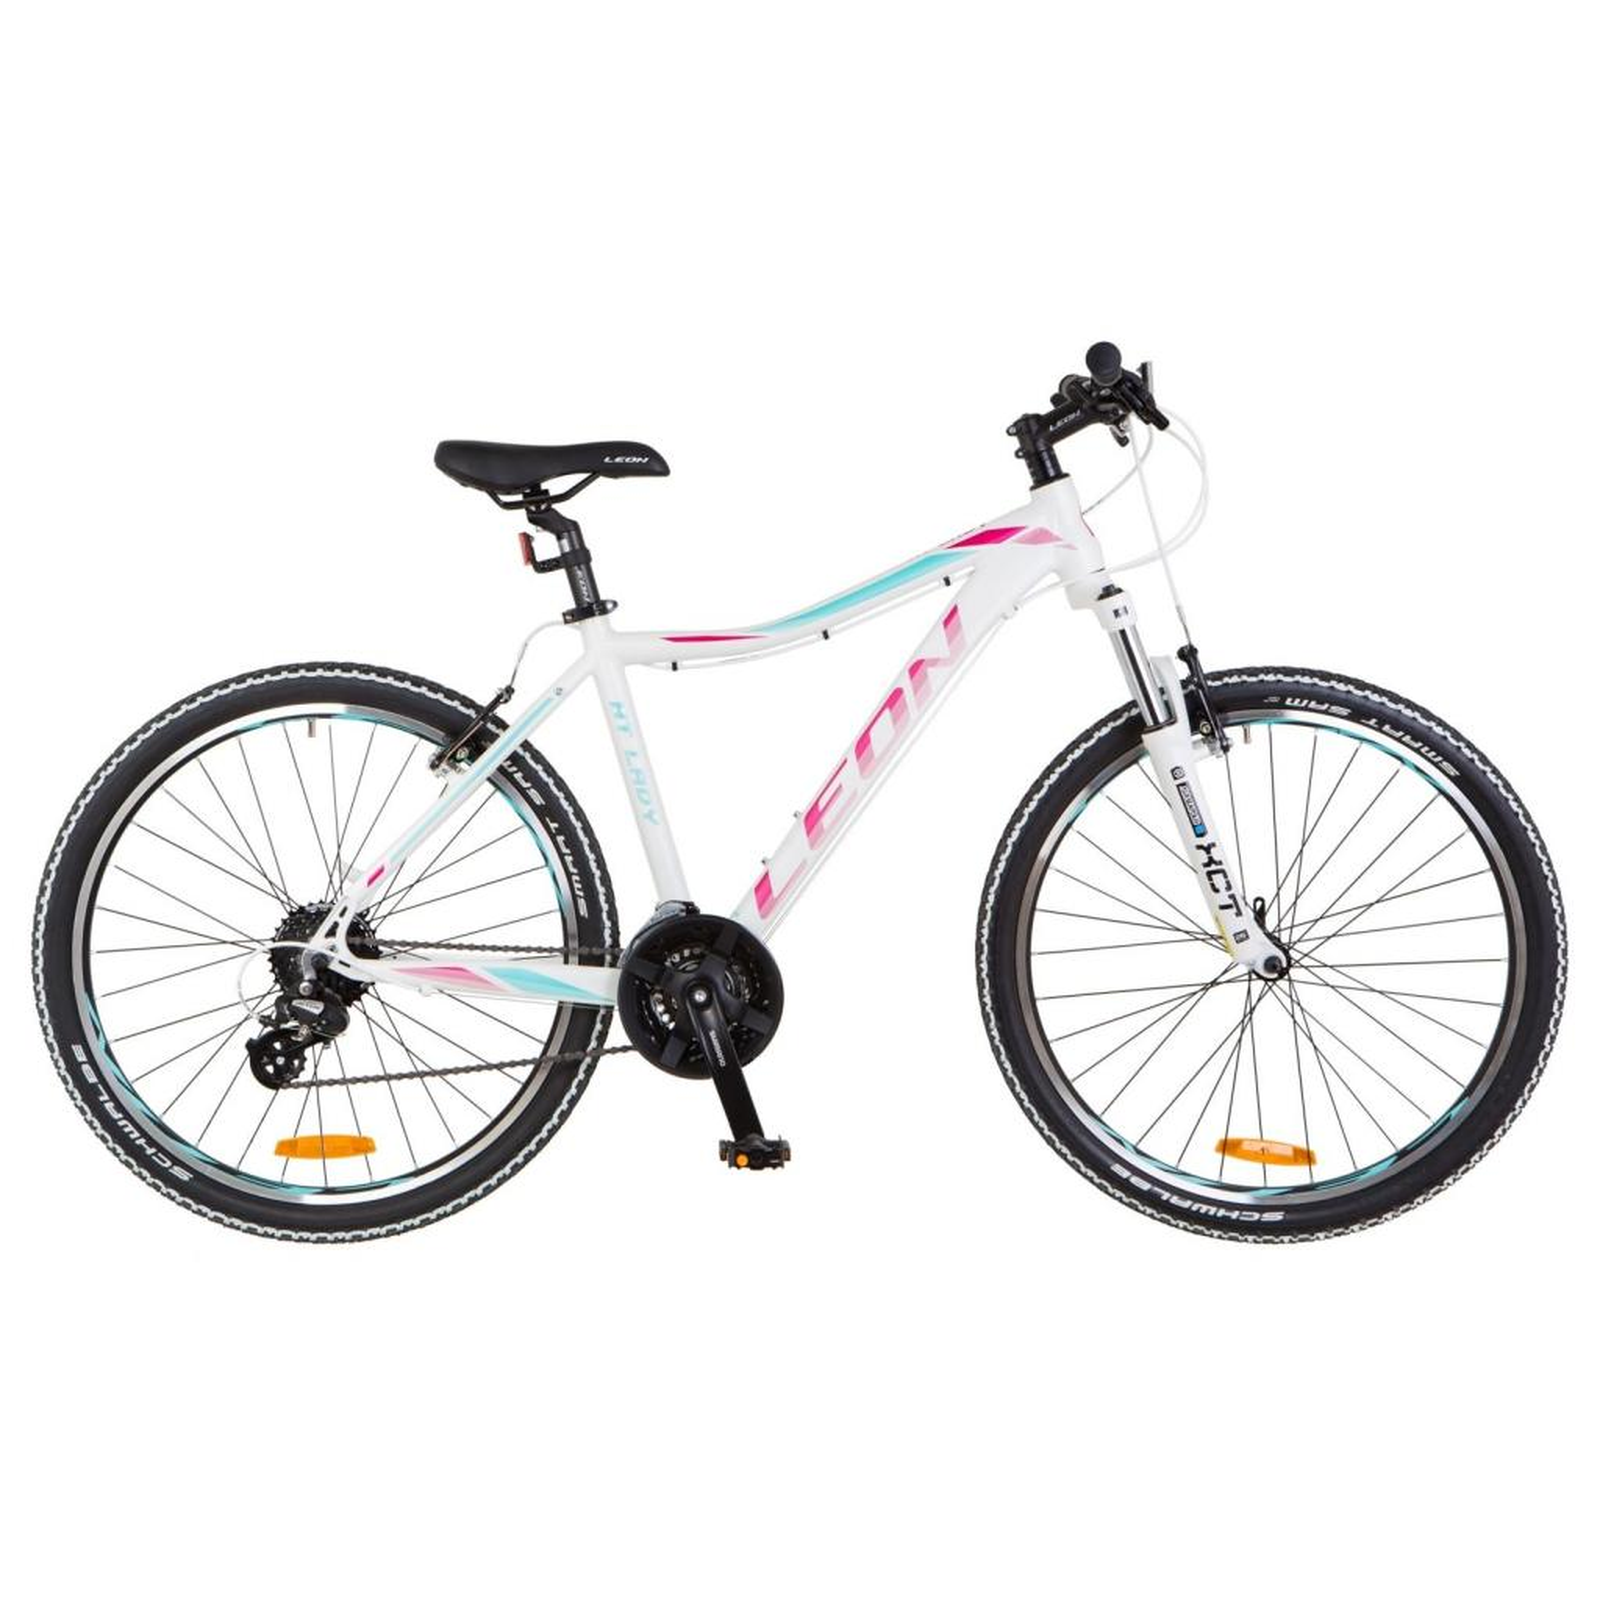 "Велосипед Leon 26"" HT-LADY 2018 AM 14G Vbr рама-16"" Al бело-малиновый (OPS-LN-26-032)"